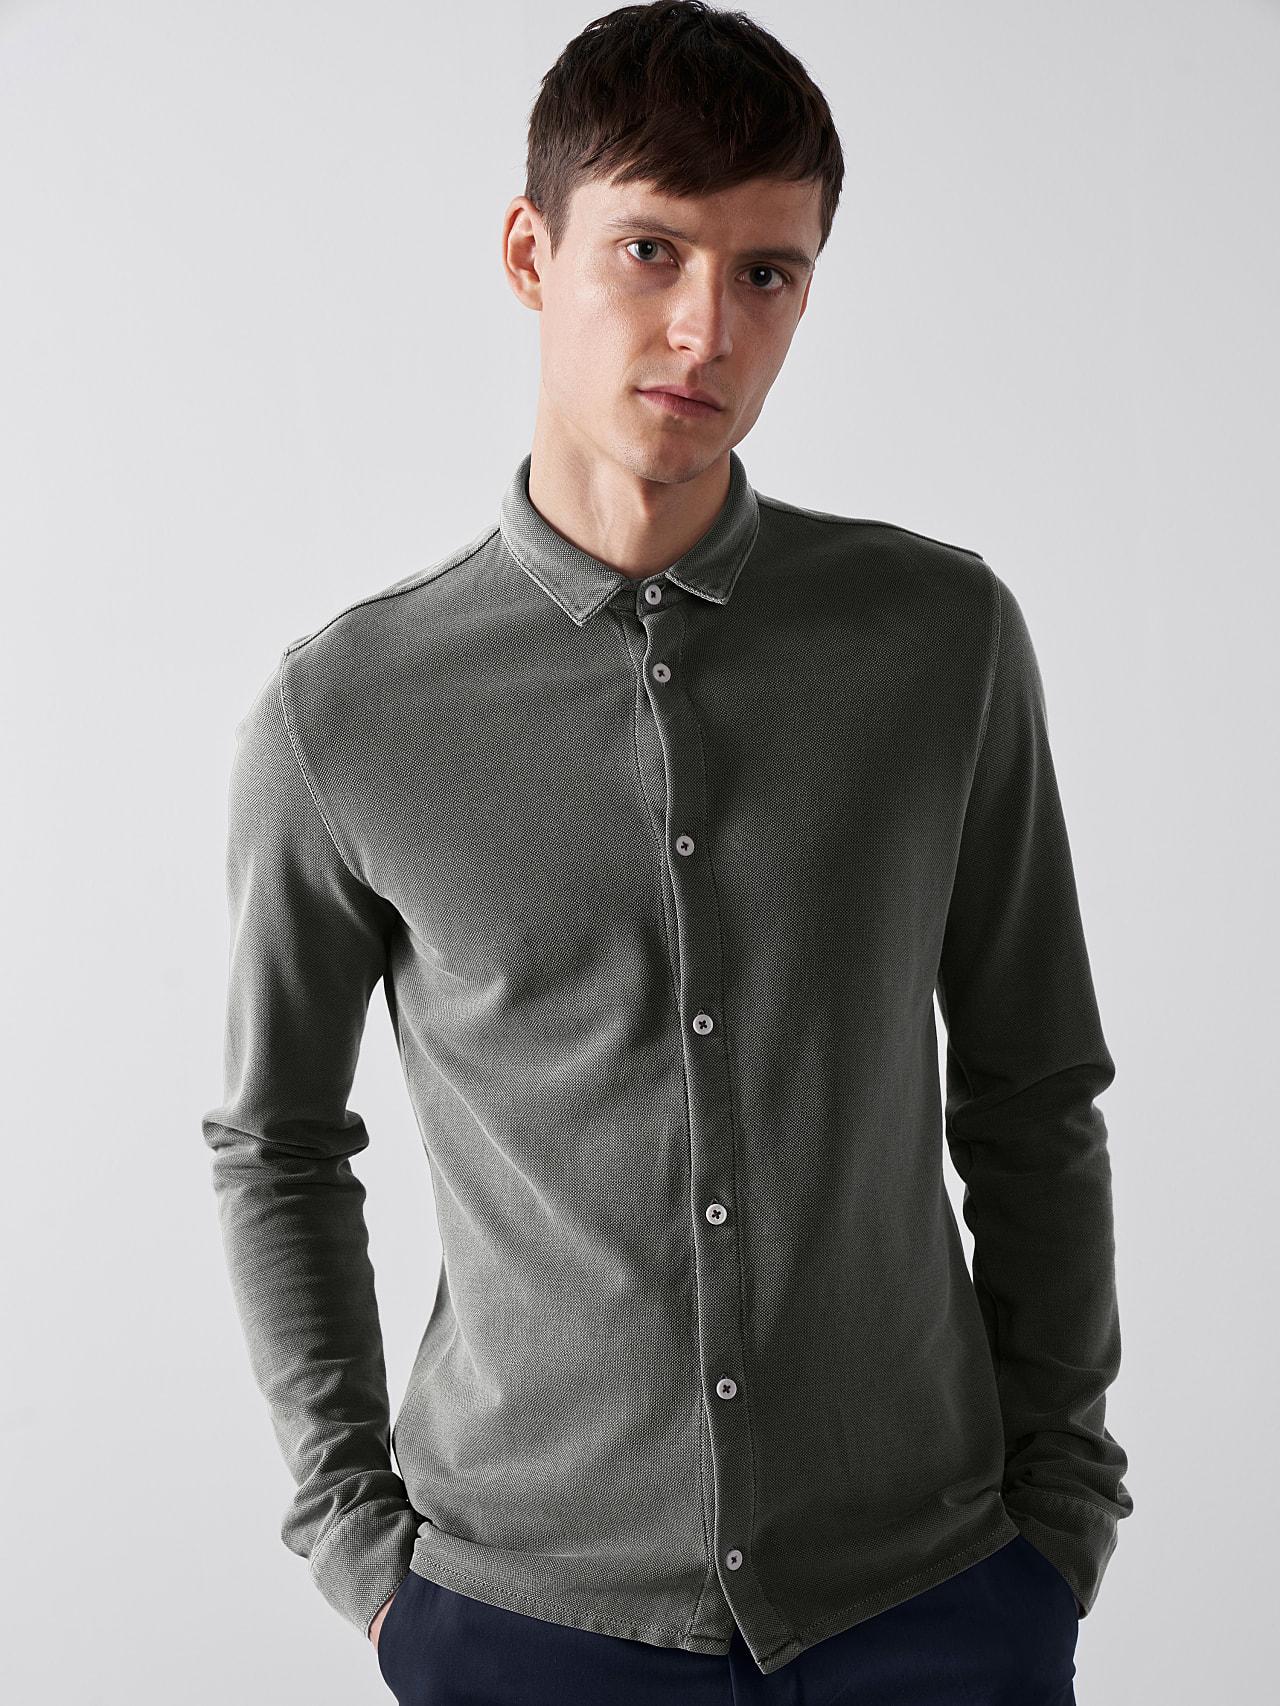 JIQUE V1.Y5.01 Pique Shirt with Kent Collar dark grey / anthracite Model shot Alpha Tauri